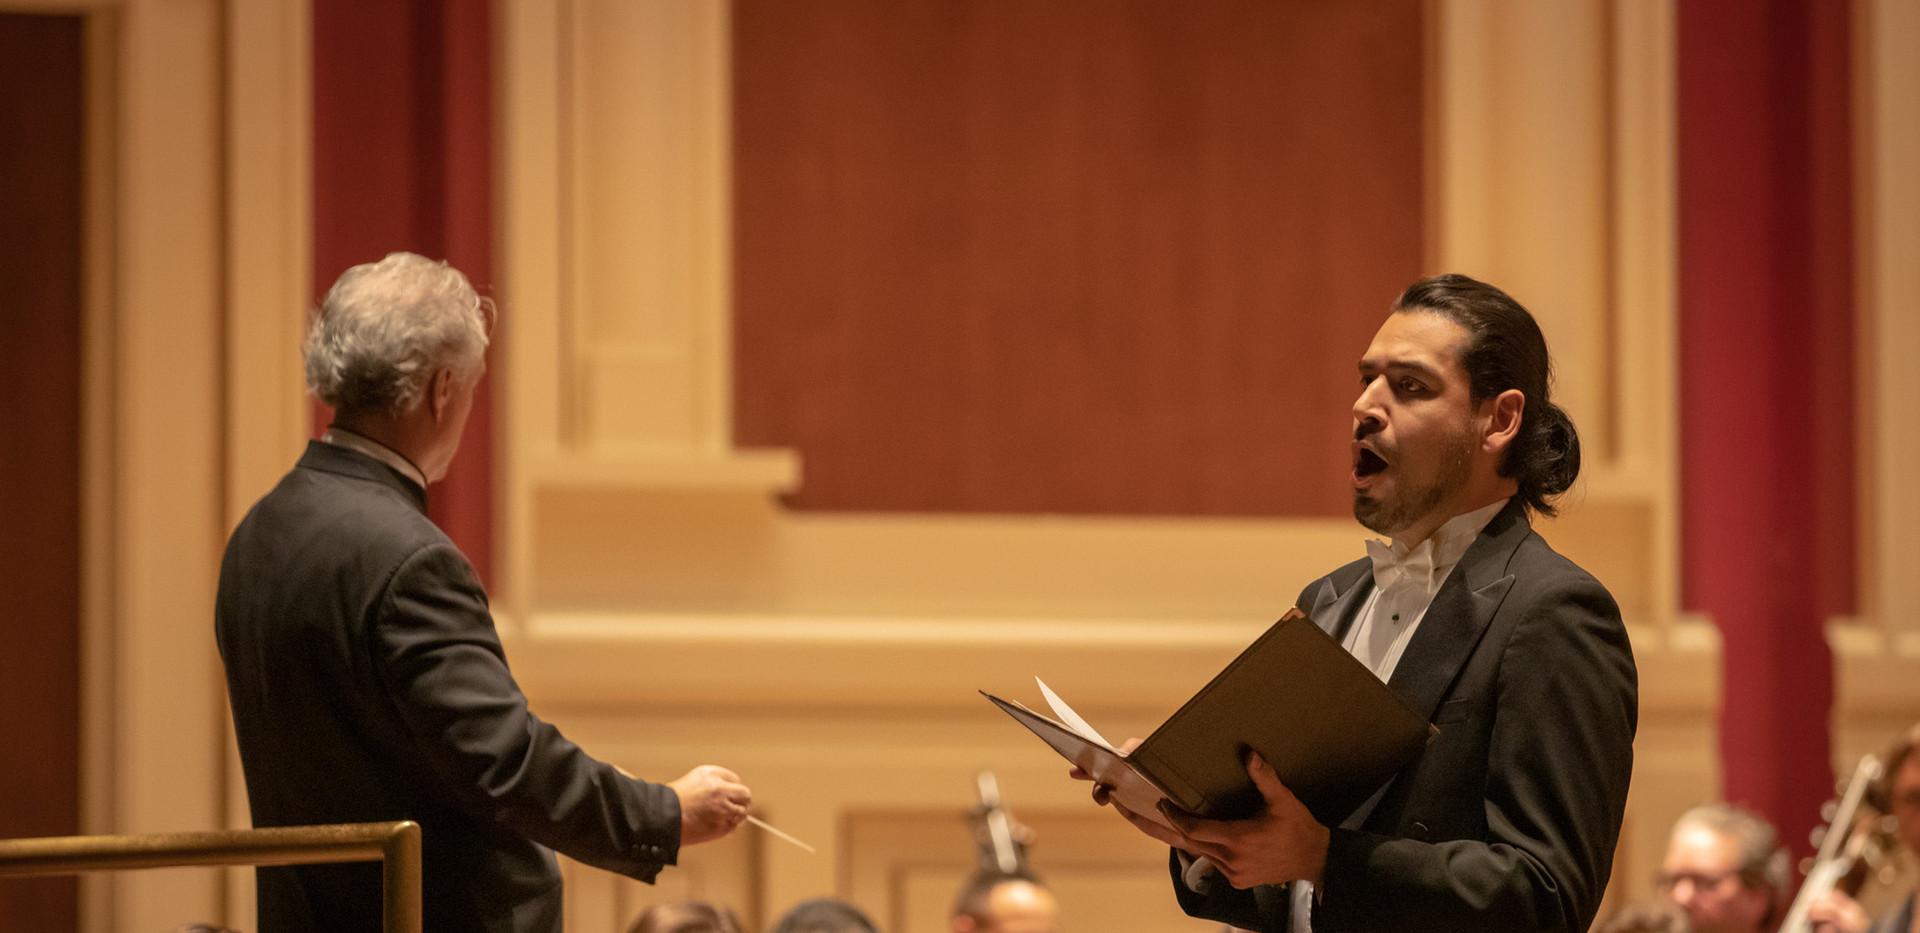 Manfred Honeck - conductor Pittsburgh Symphony Orchestra photo - Edward DeArmitt